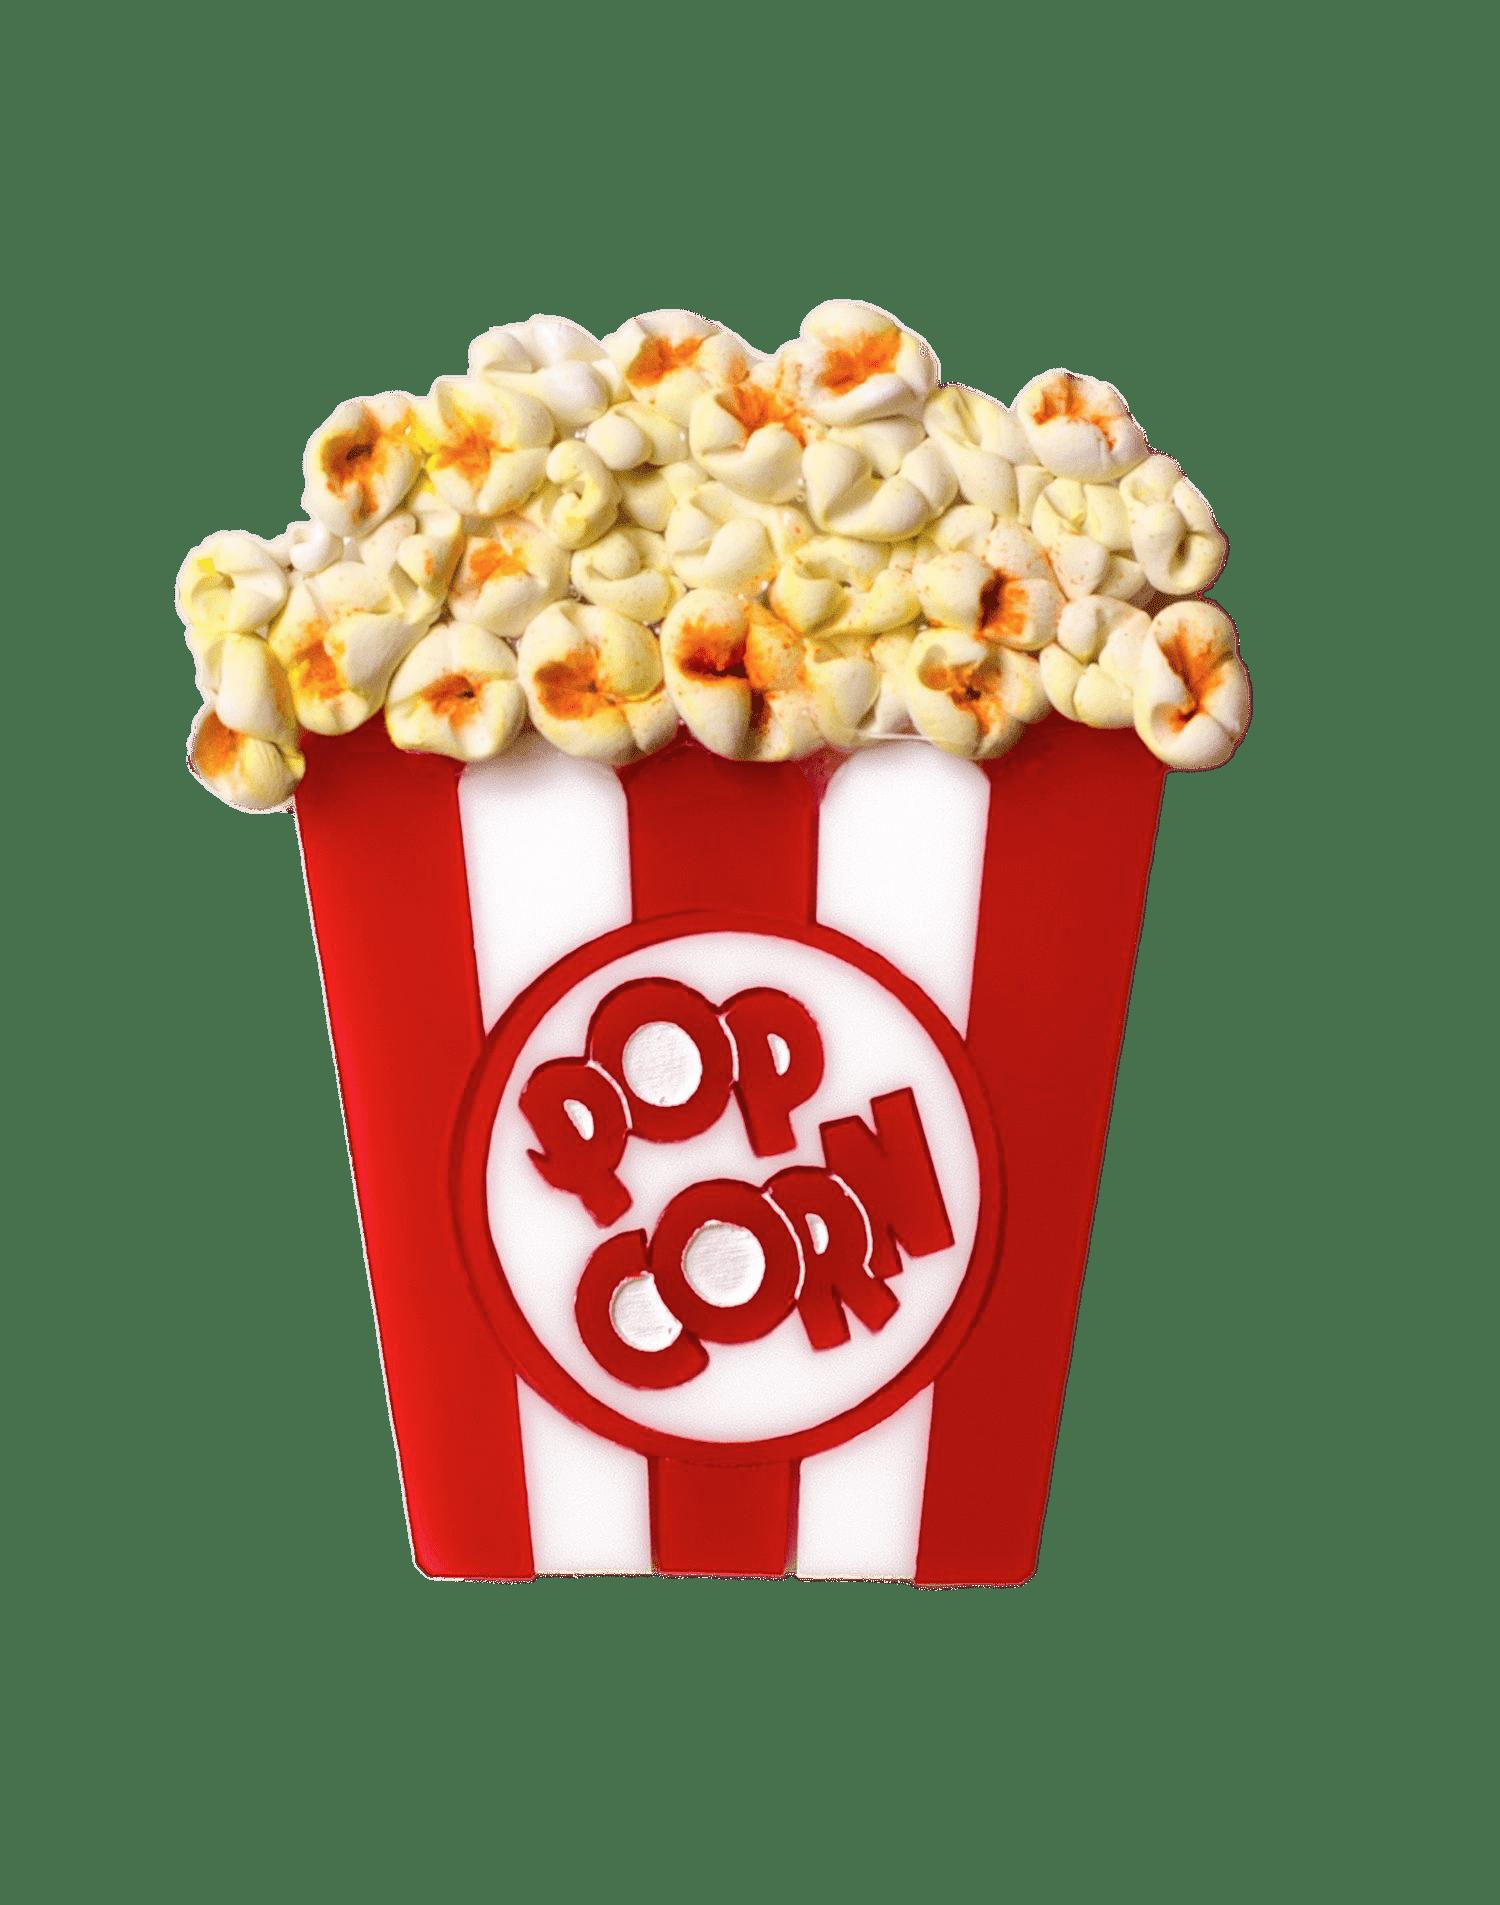 Popcorn PNG Images Transparent Background   PNG Play